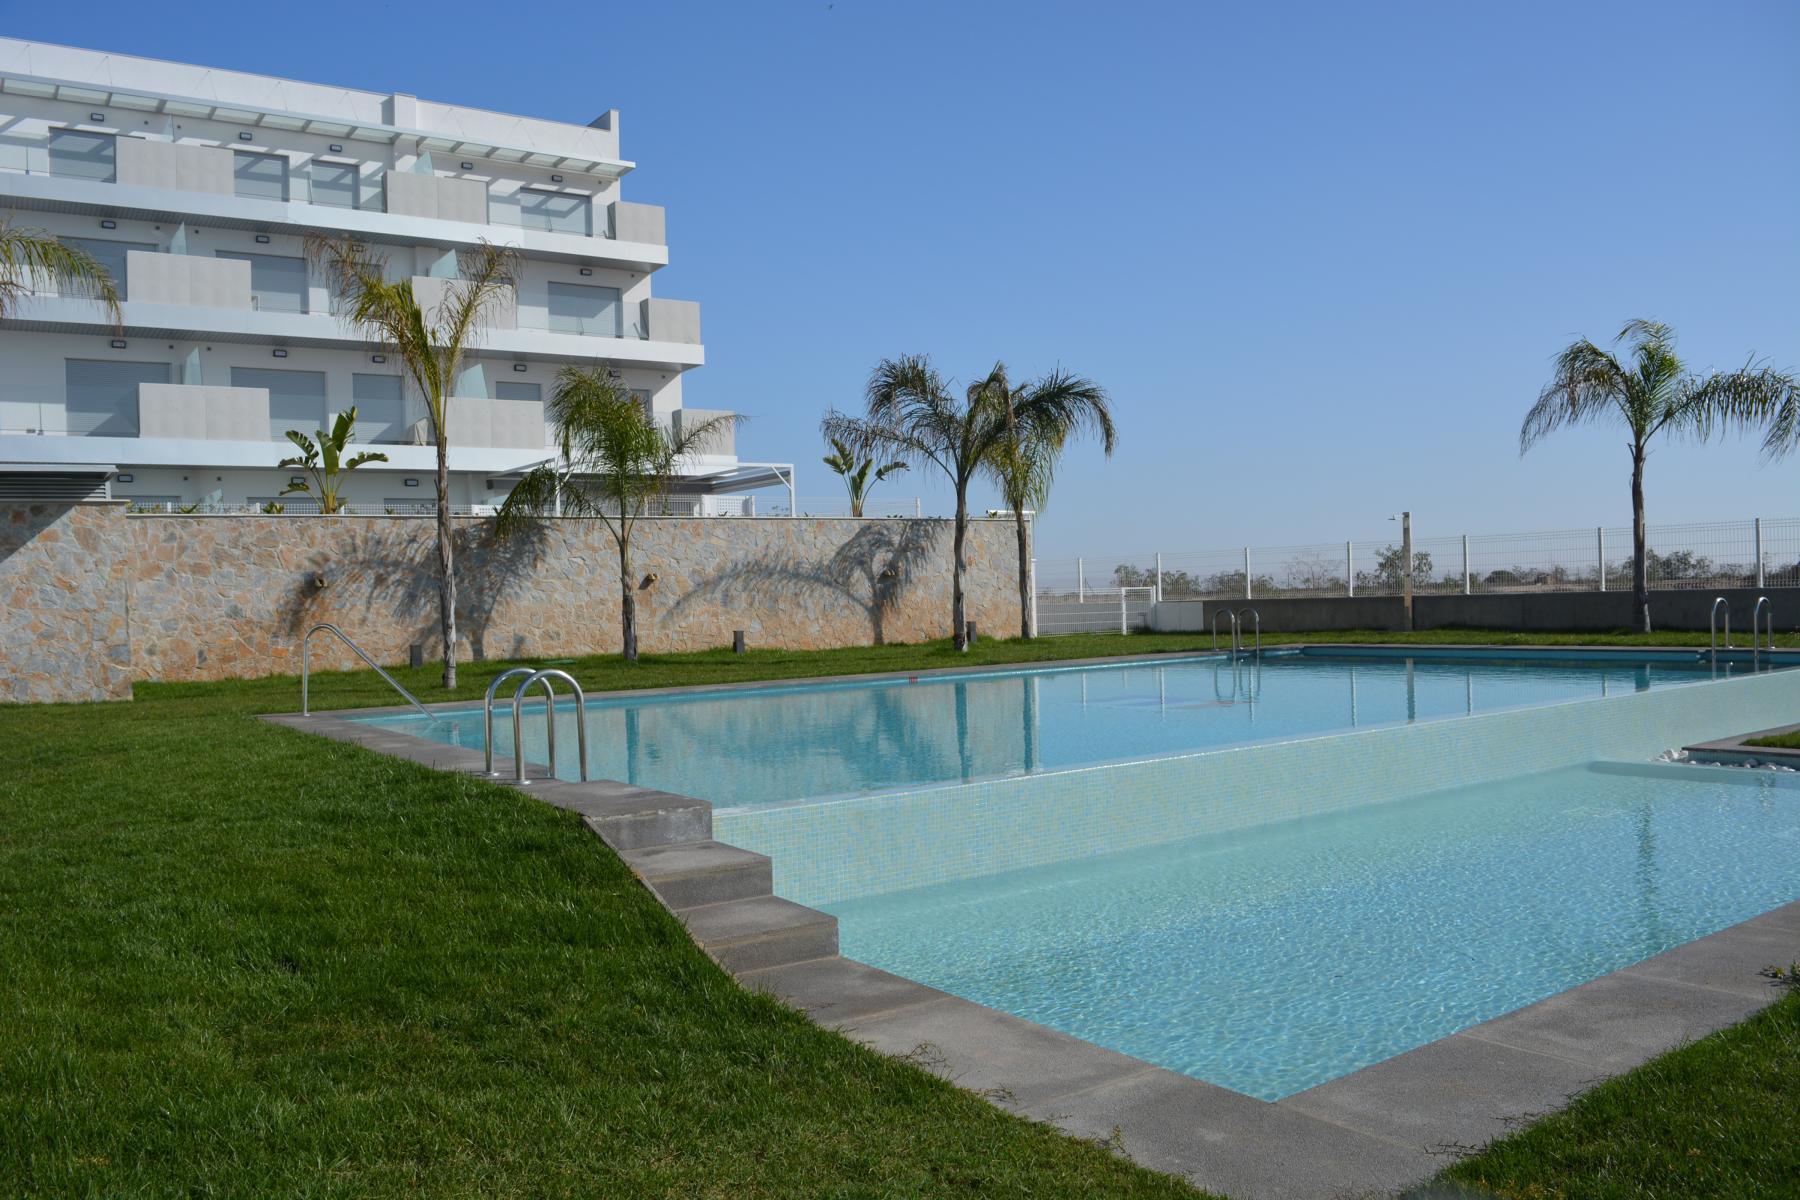 pool-14m-x-8-m